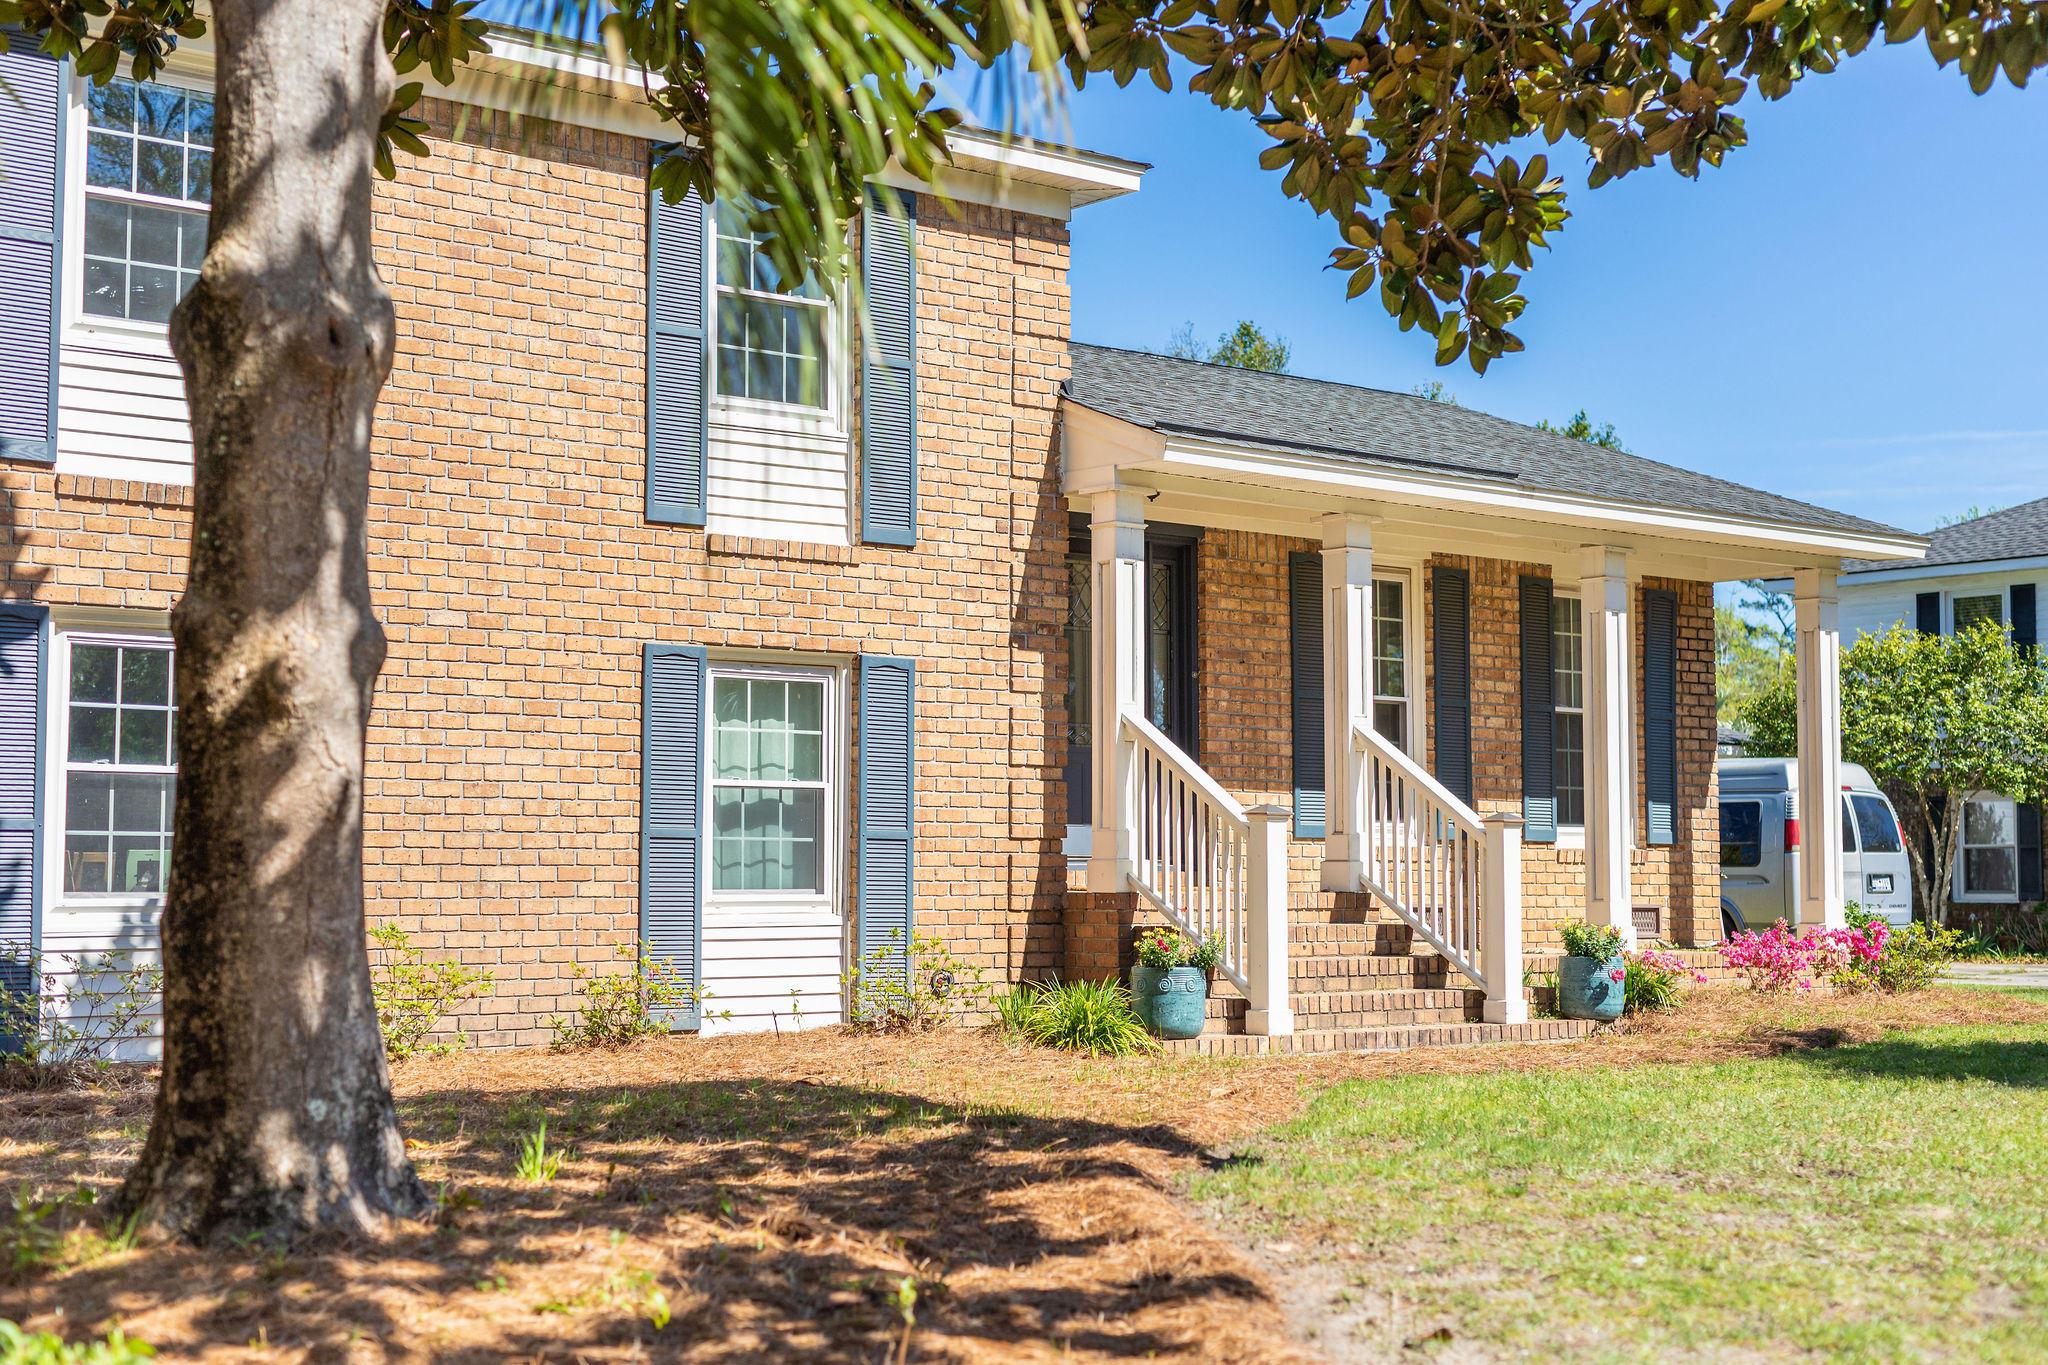 Cooper Estates Homes For Sale - 1058 Cottingham, Mount Pleasant, SC - 1